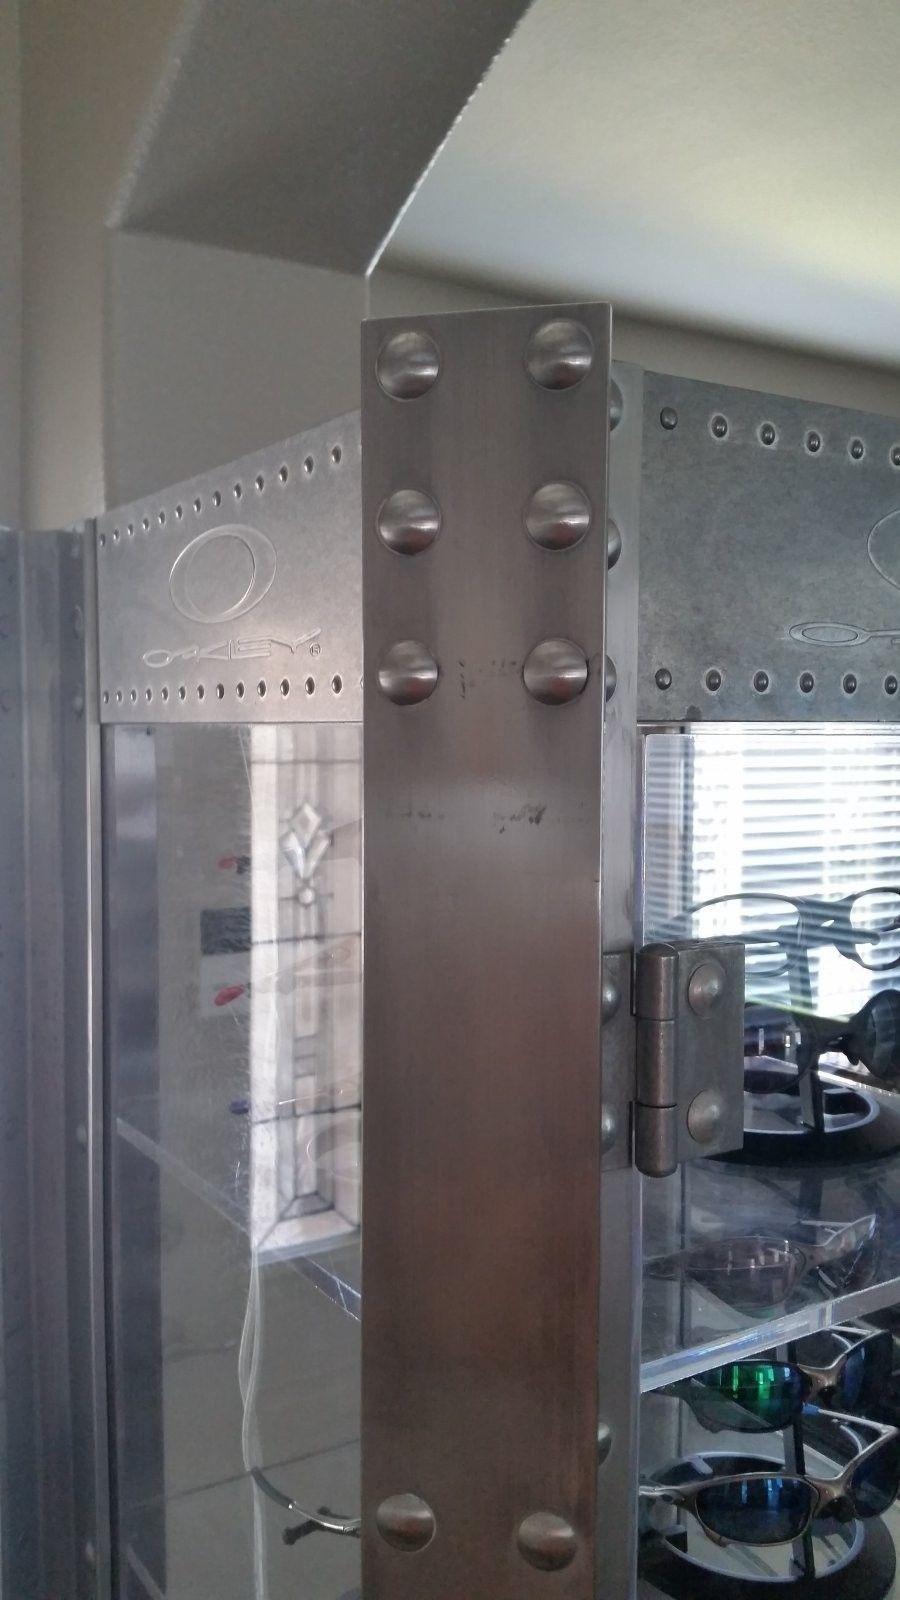 Aluminum Display Case - Polish Product Review - 20140906_131204.jpg